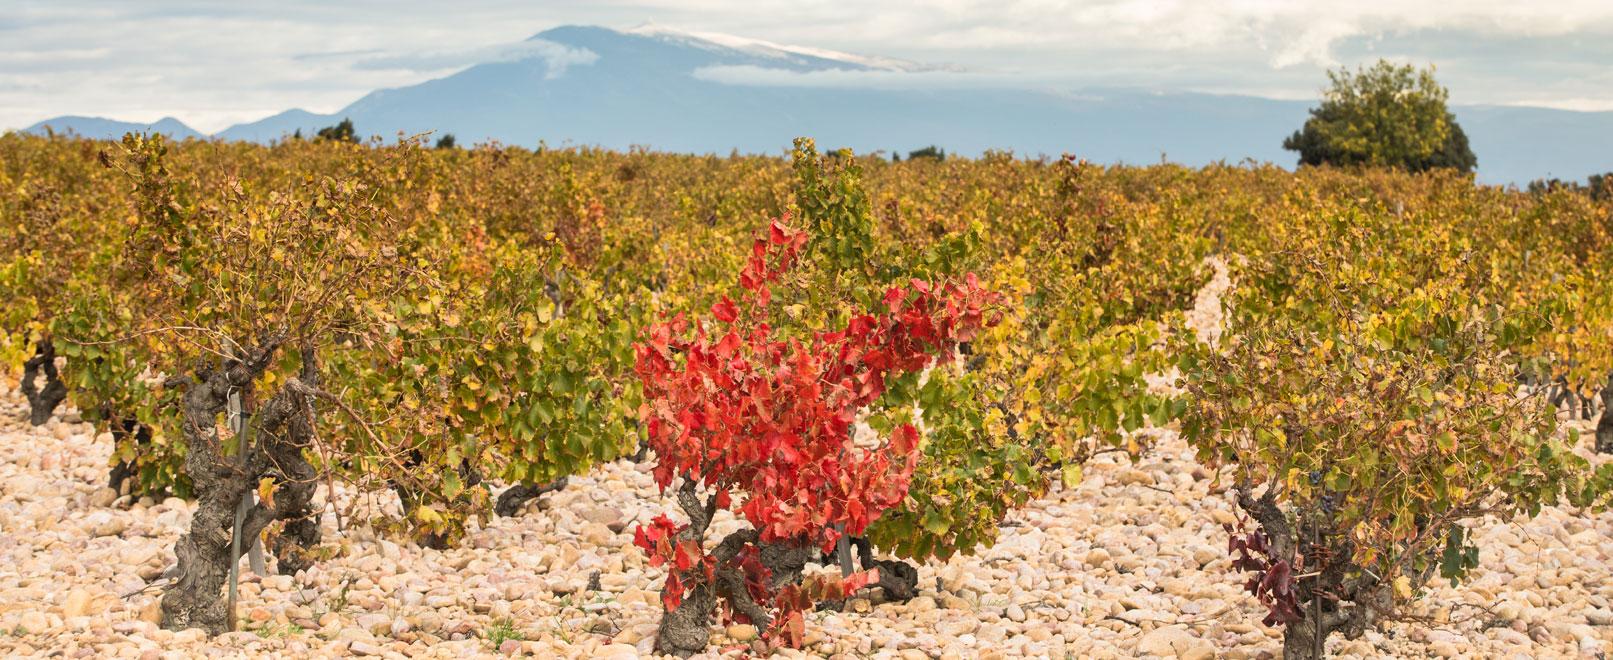 Vignes en Vallée du Rhône © Kessler